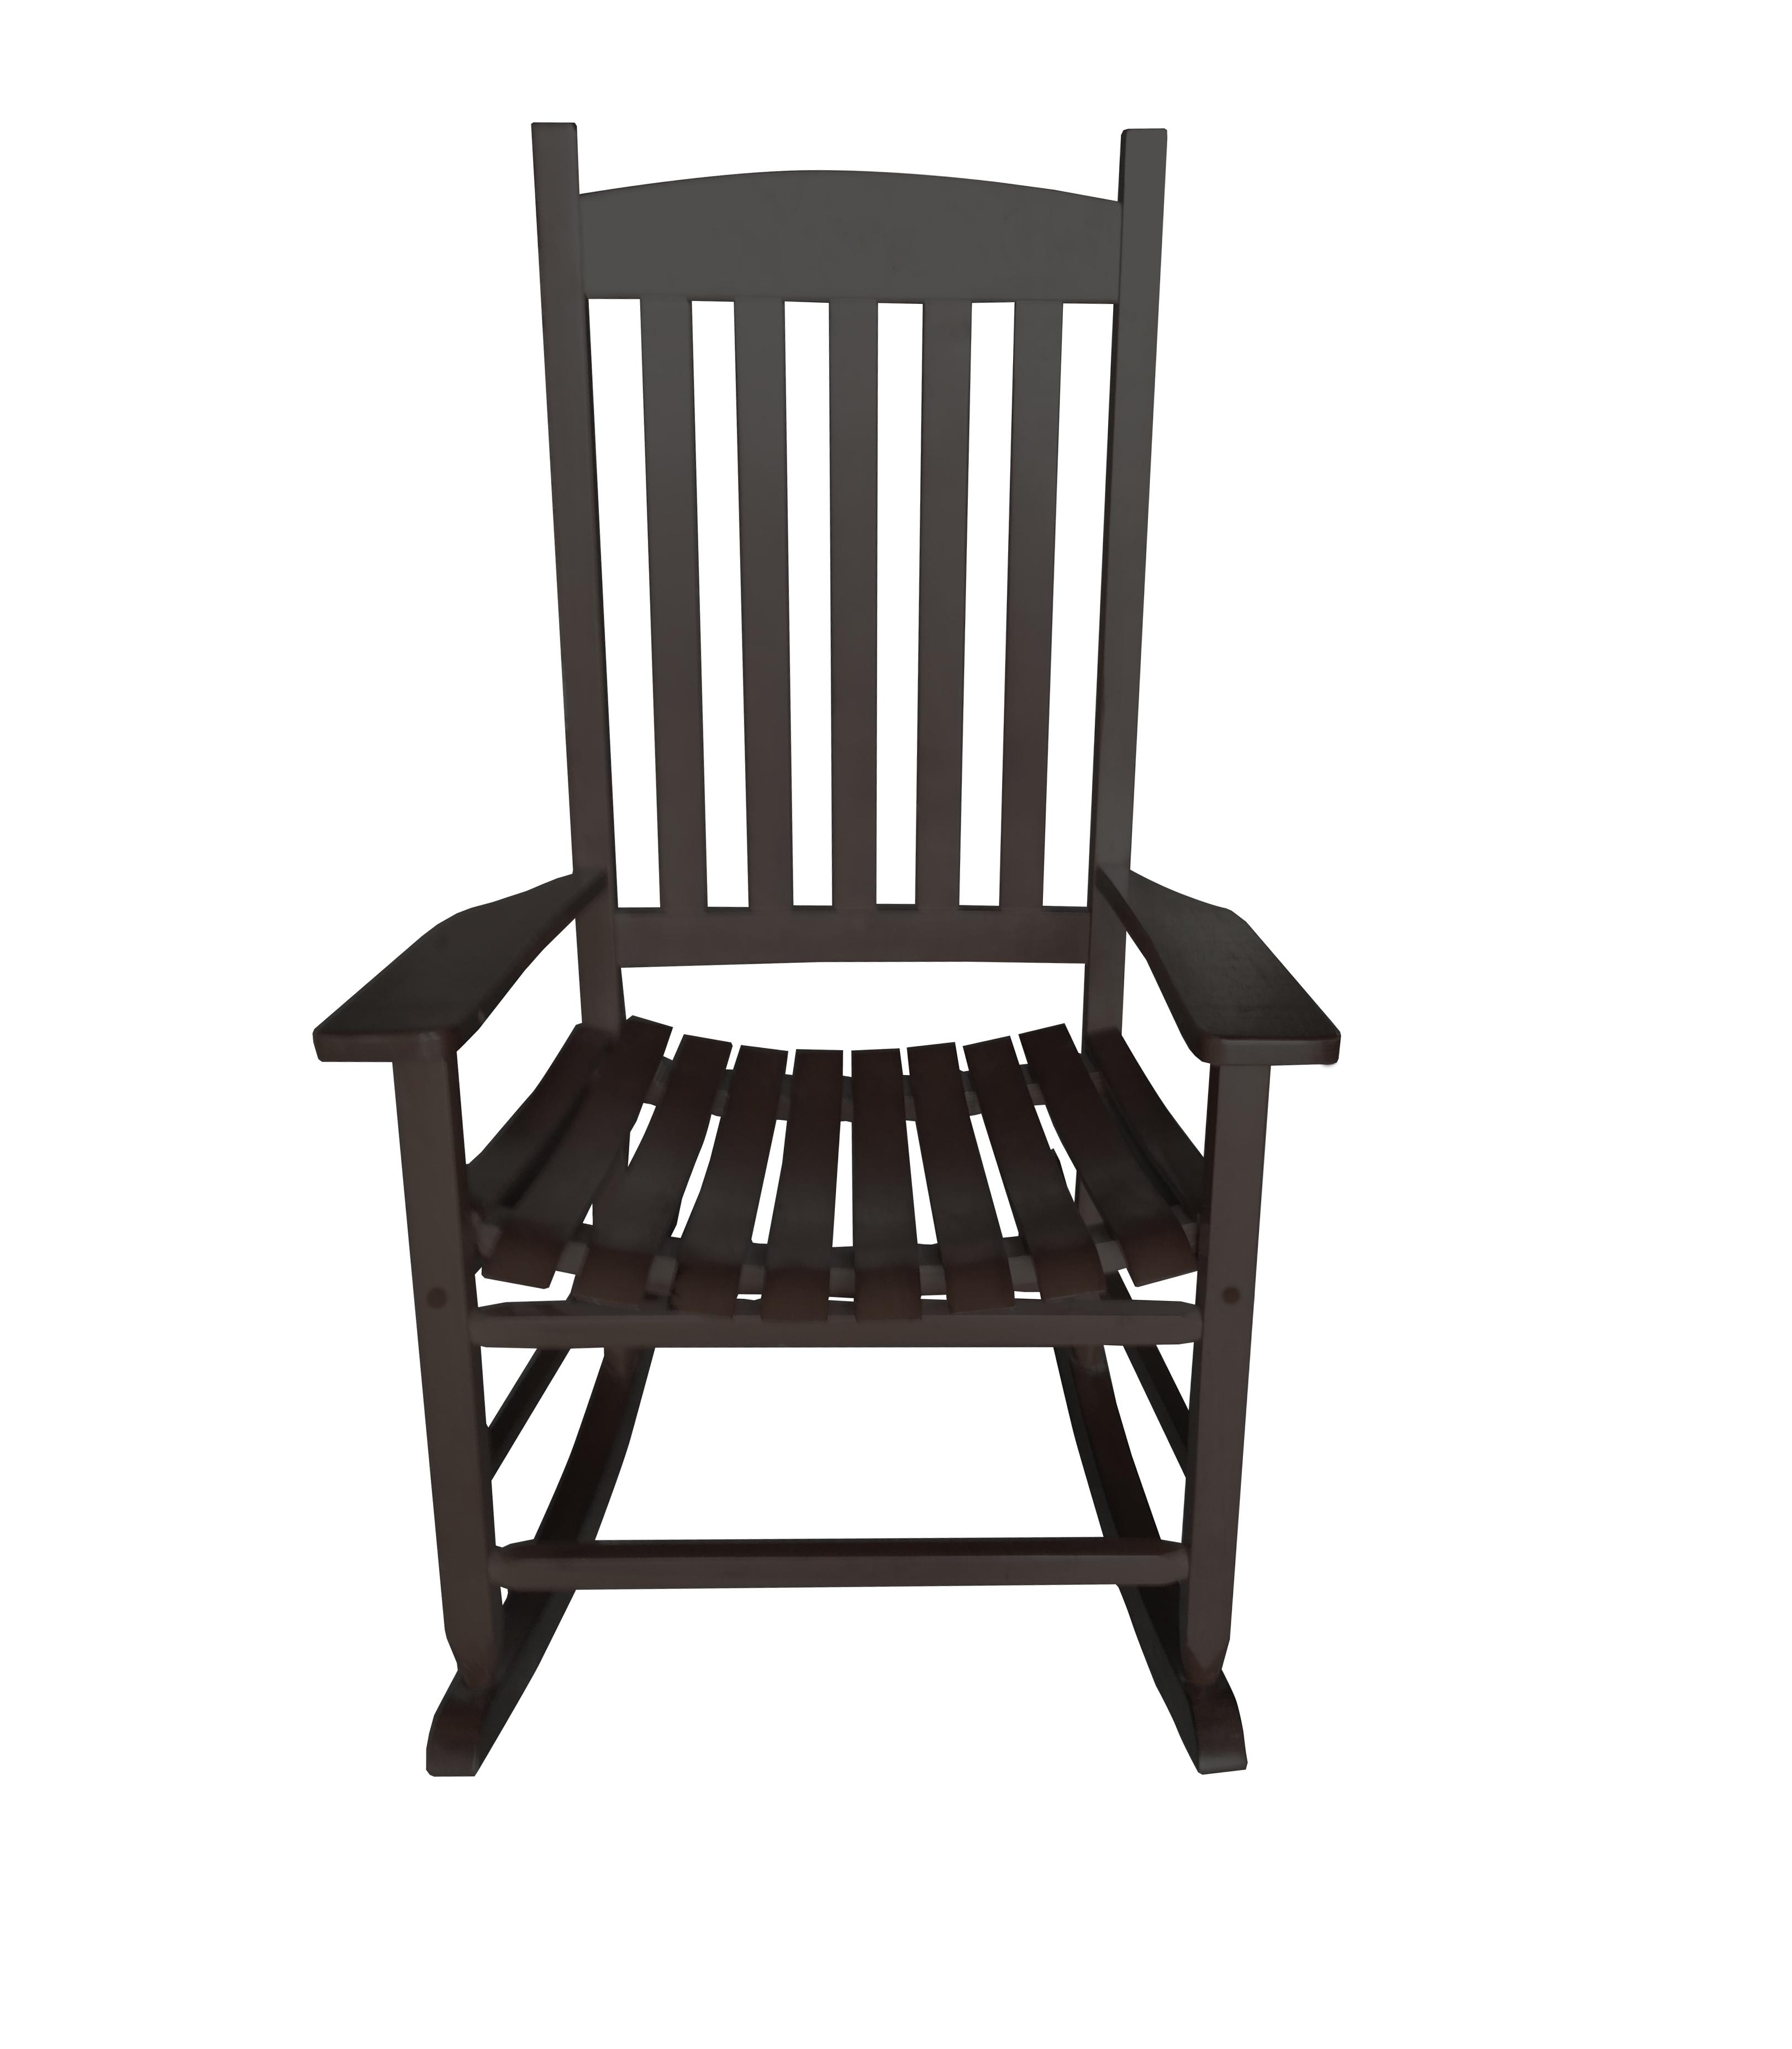 Mainstays Outdoor Wood Slat Rocking Chair - Walmart.com